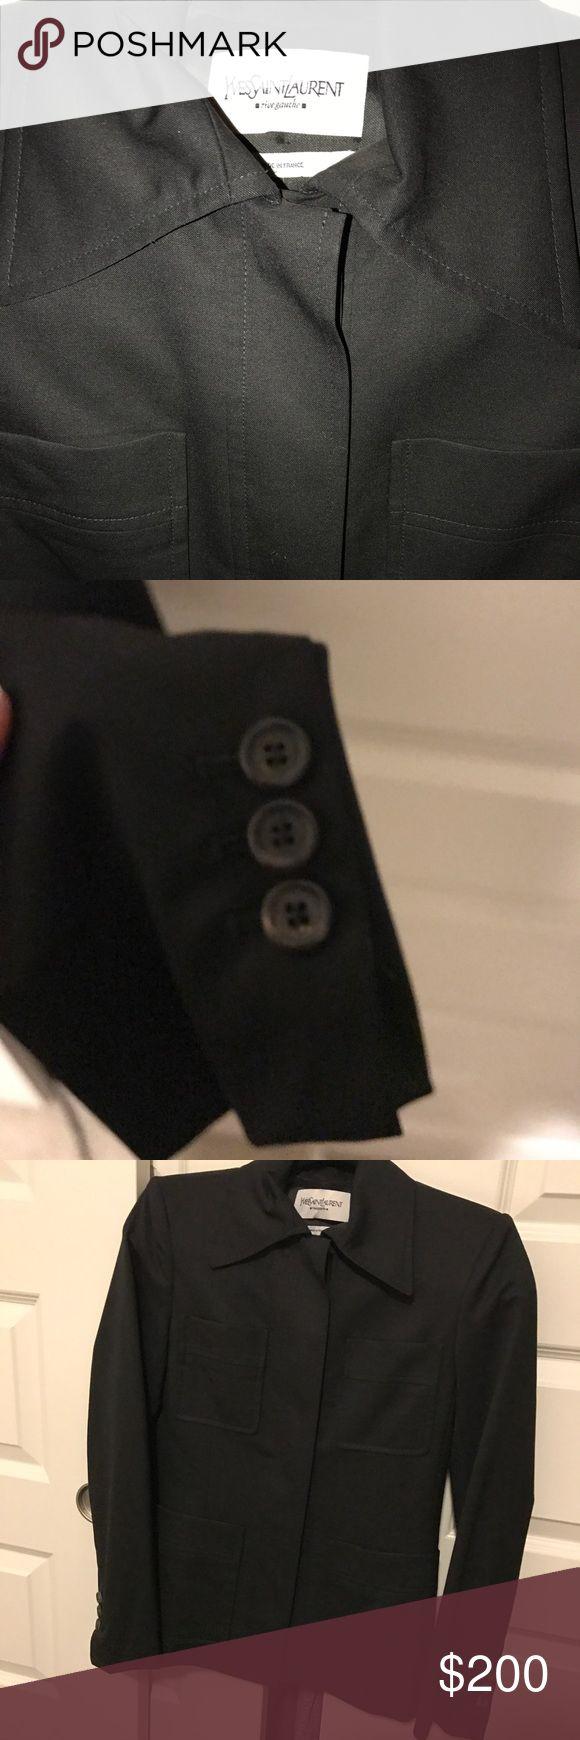 YSL Safari blazer Authentic YSL suit jacket Yves Saint Laurent Jackets & Coats Blazers